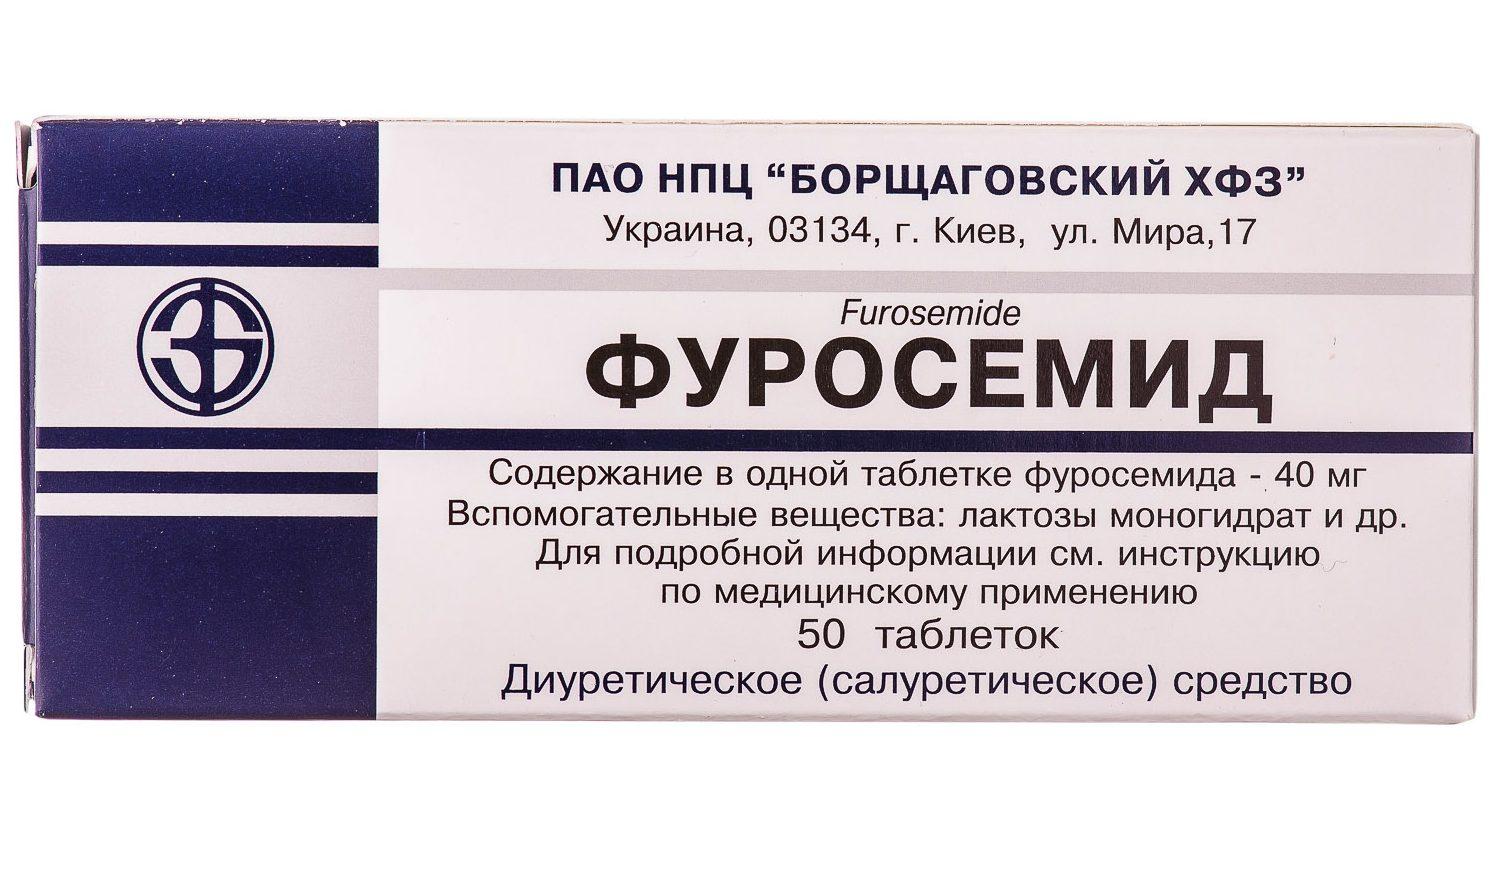 pripreme za hipertenziju inderal)